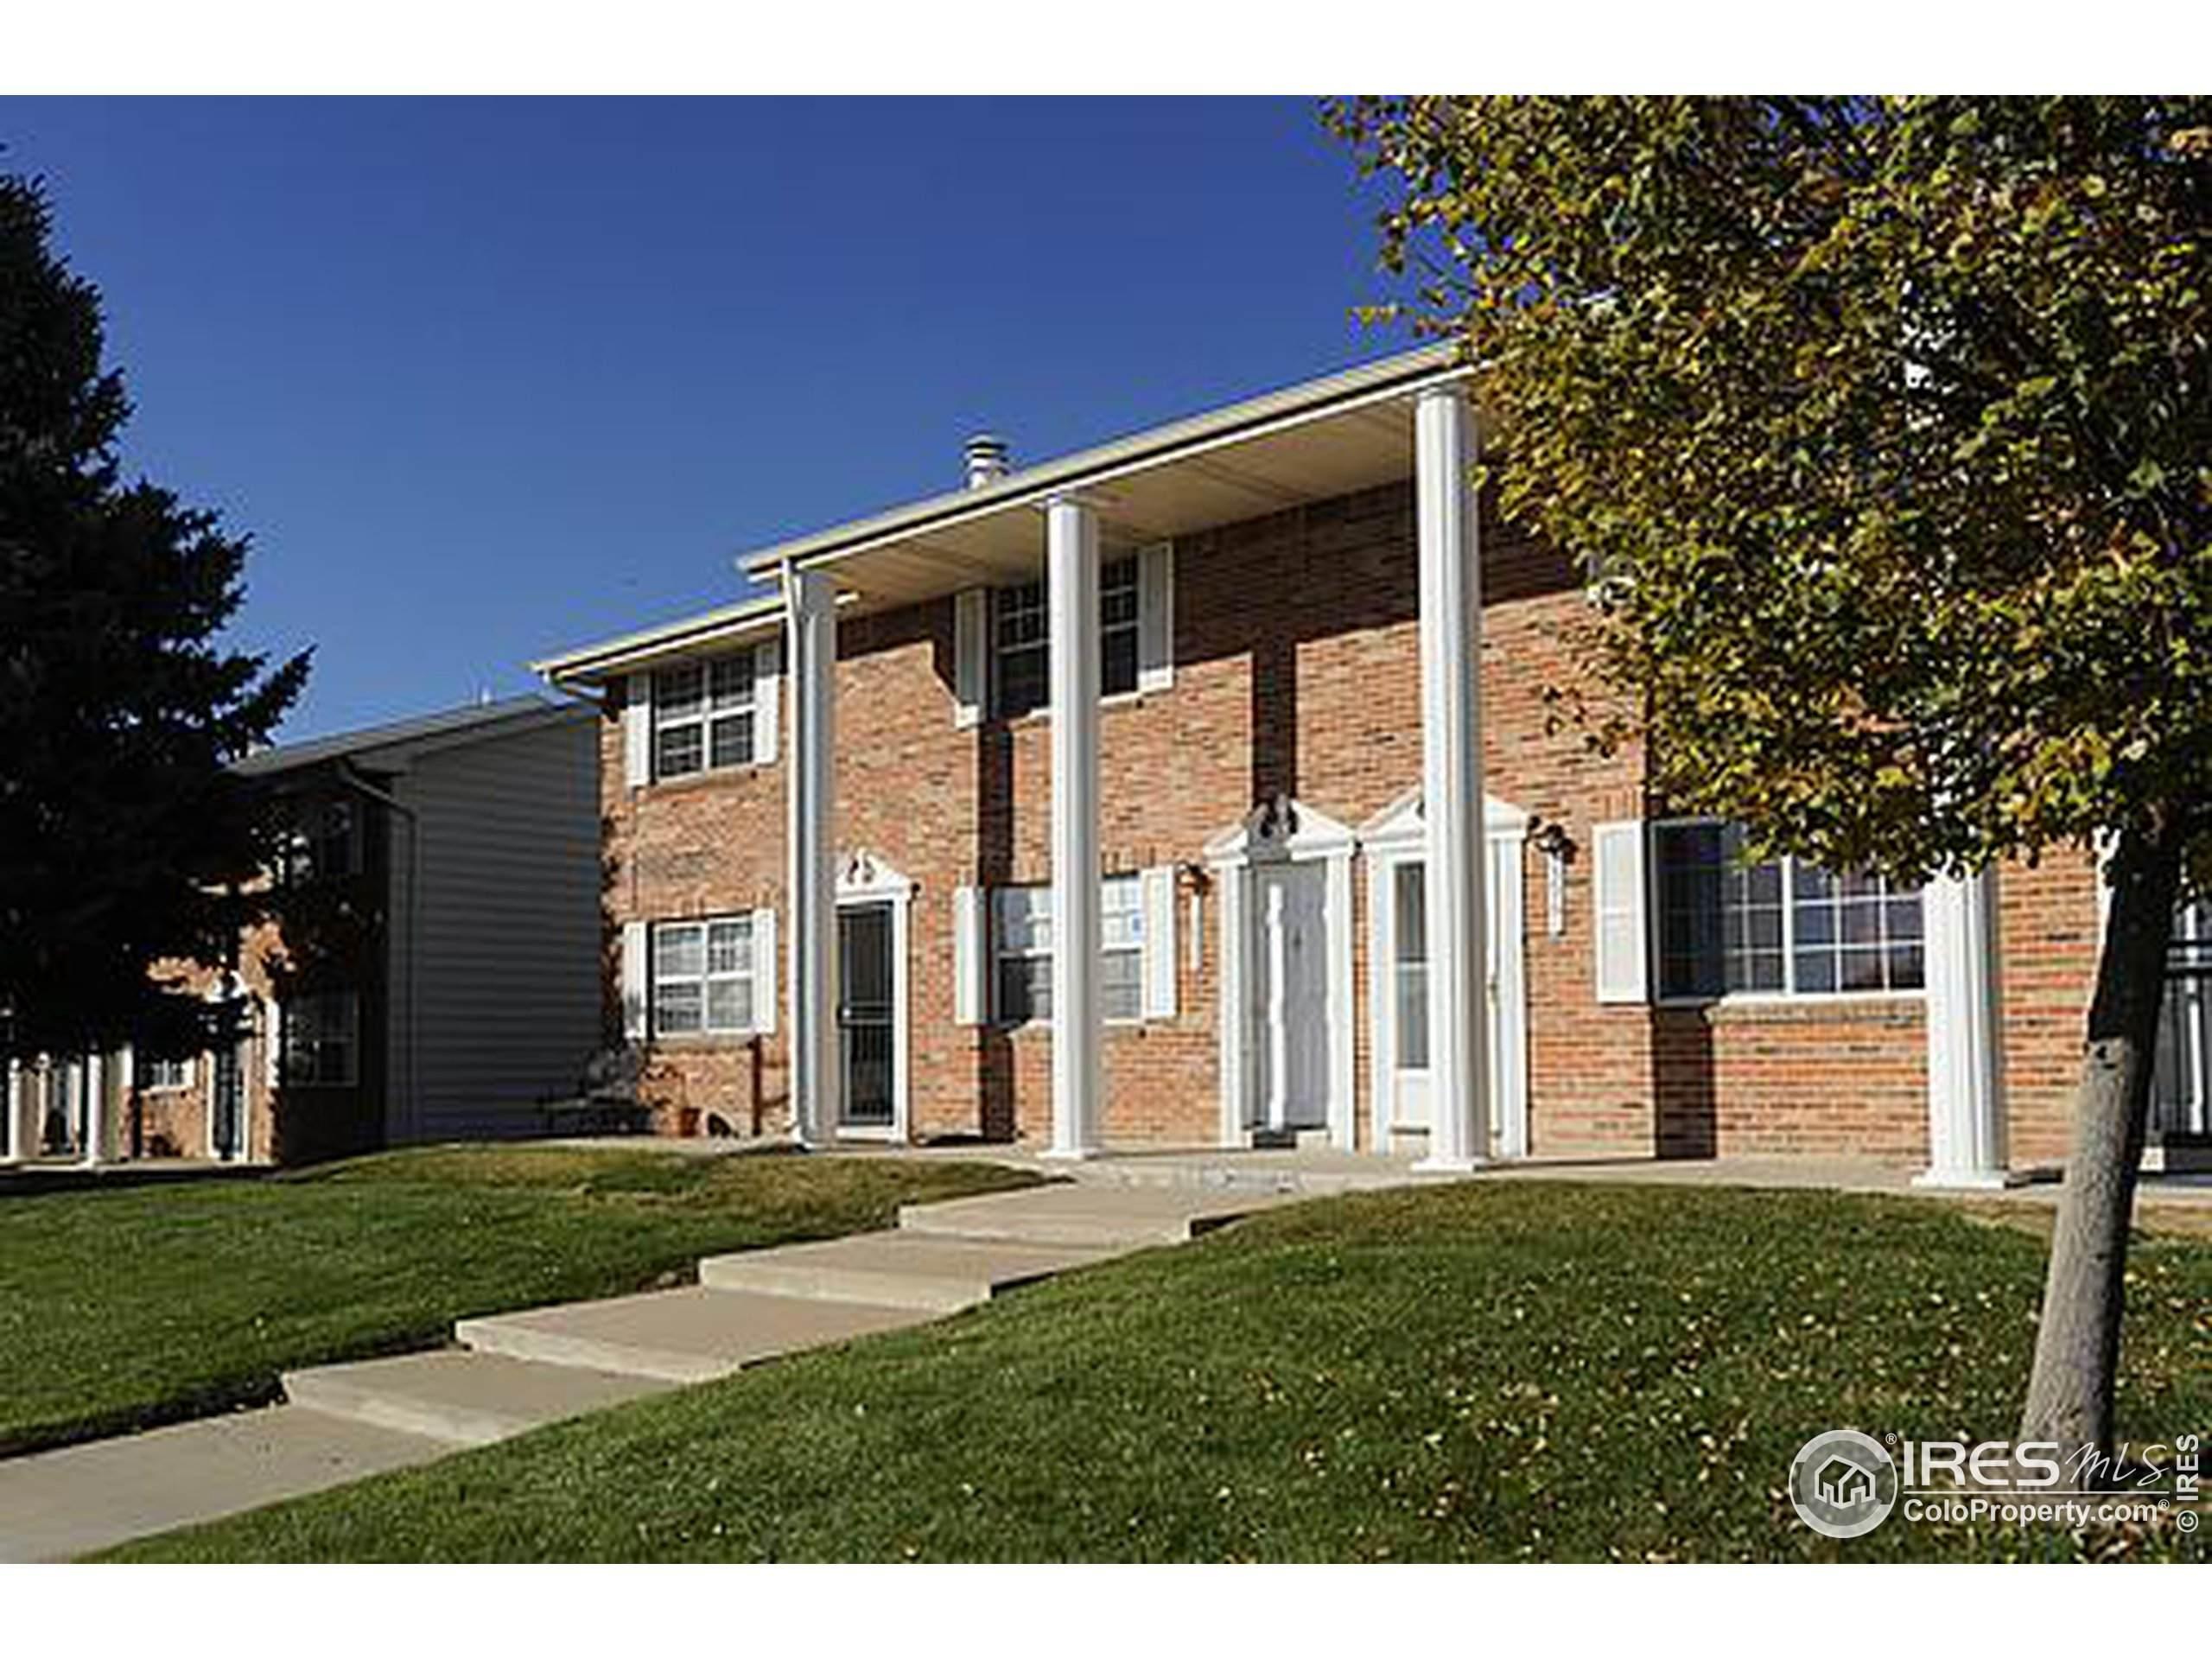 5255 E 128th Dr, Thornton, CO 80241 (MLS #942484) :: 8z Real Estate